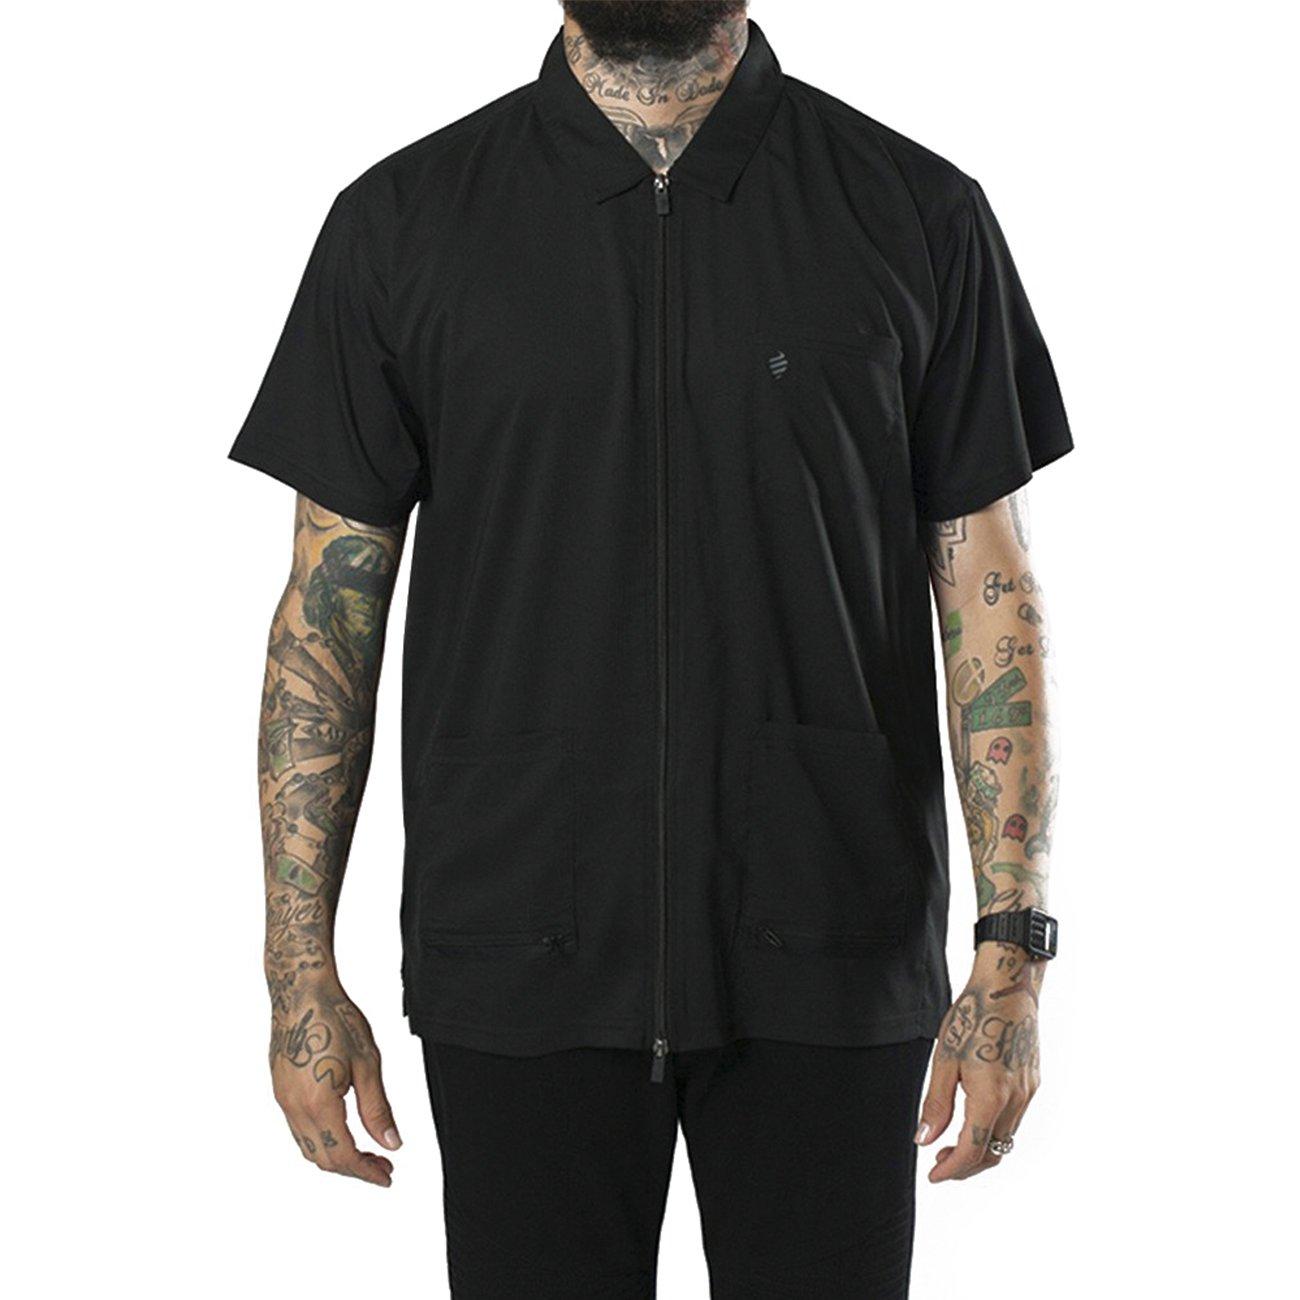 Barber Strong Jacket, Black, Medium